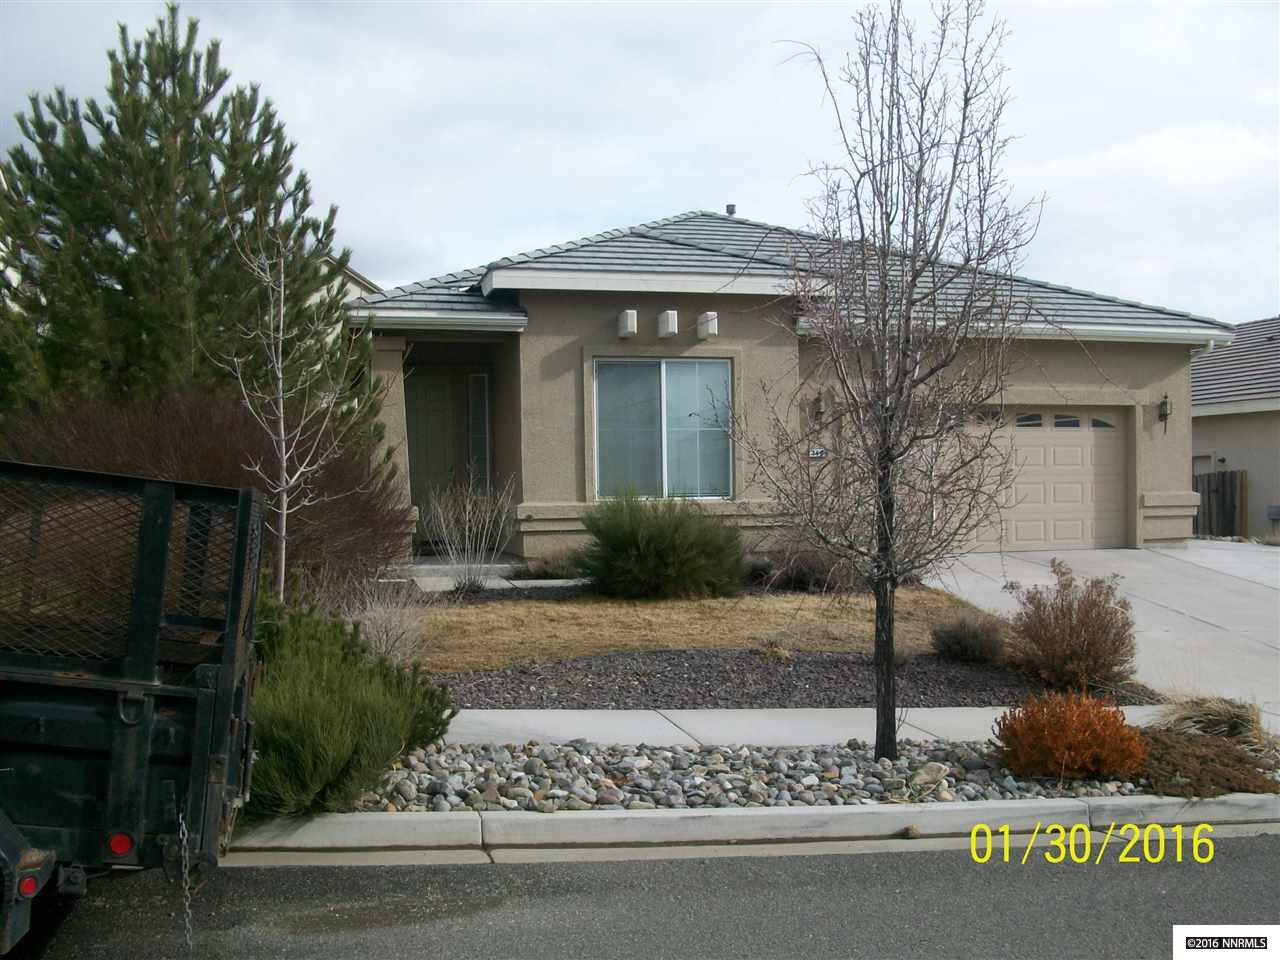 7480 Hunter Glen Dr, Reno, NV